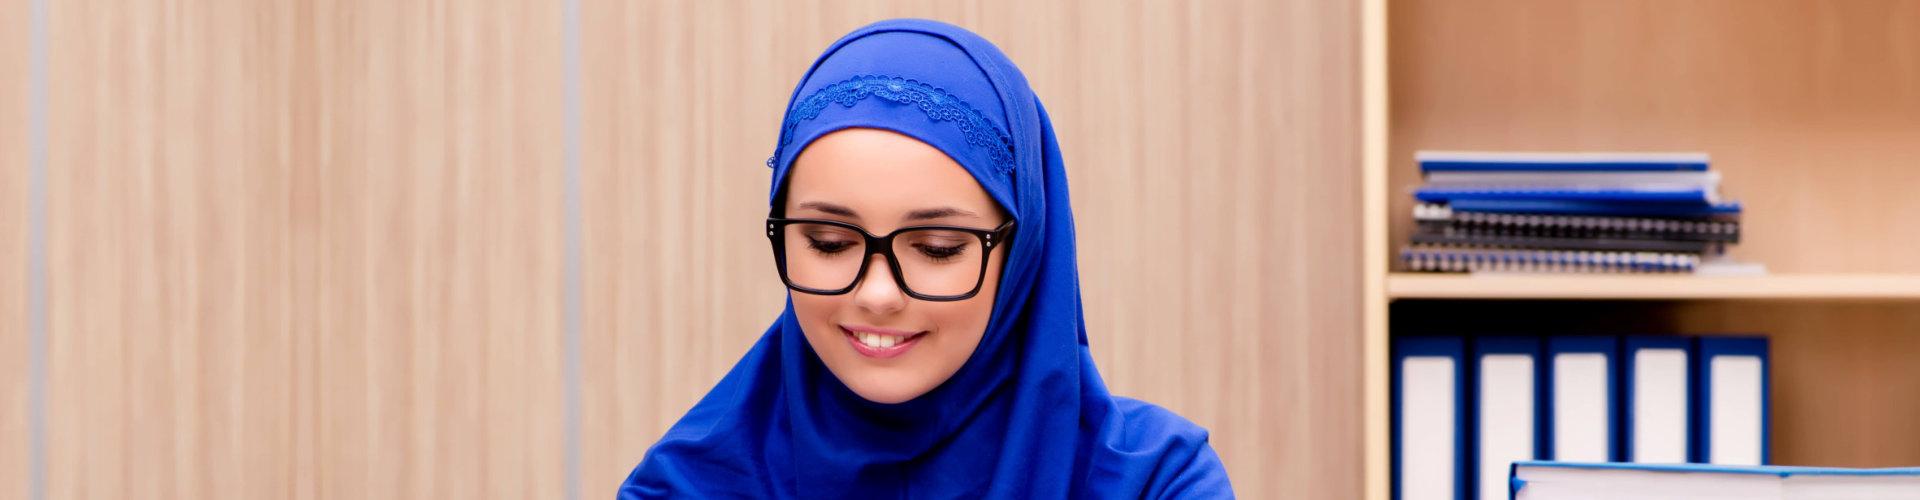 female muslim wearing eye glasses